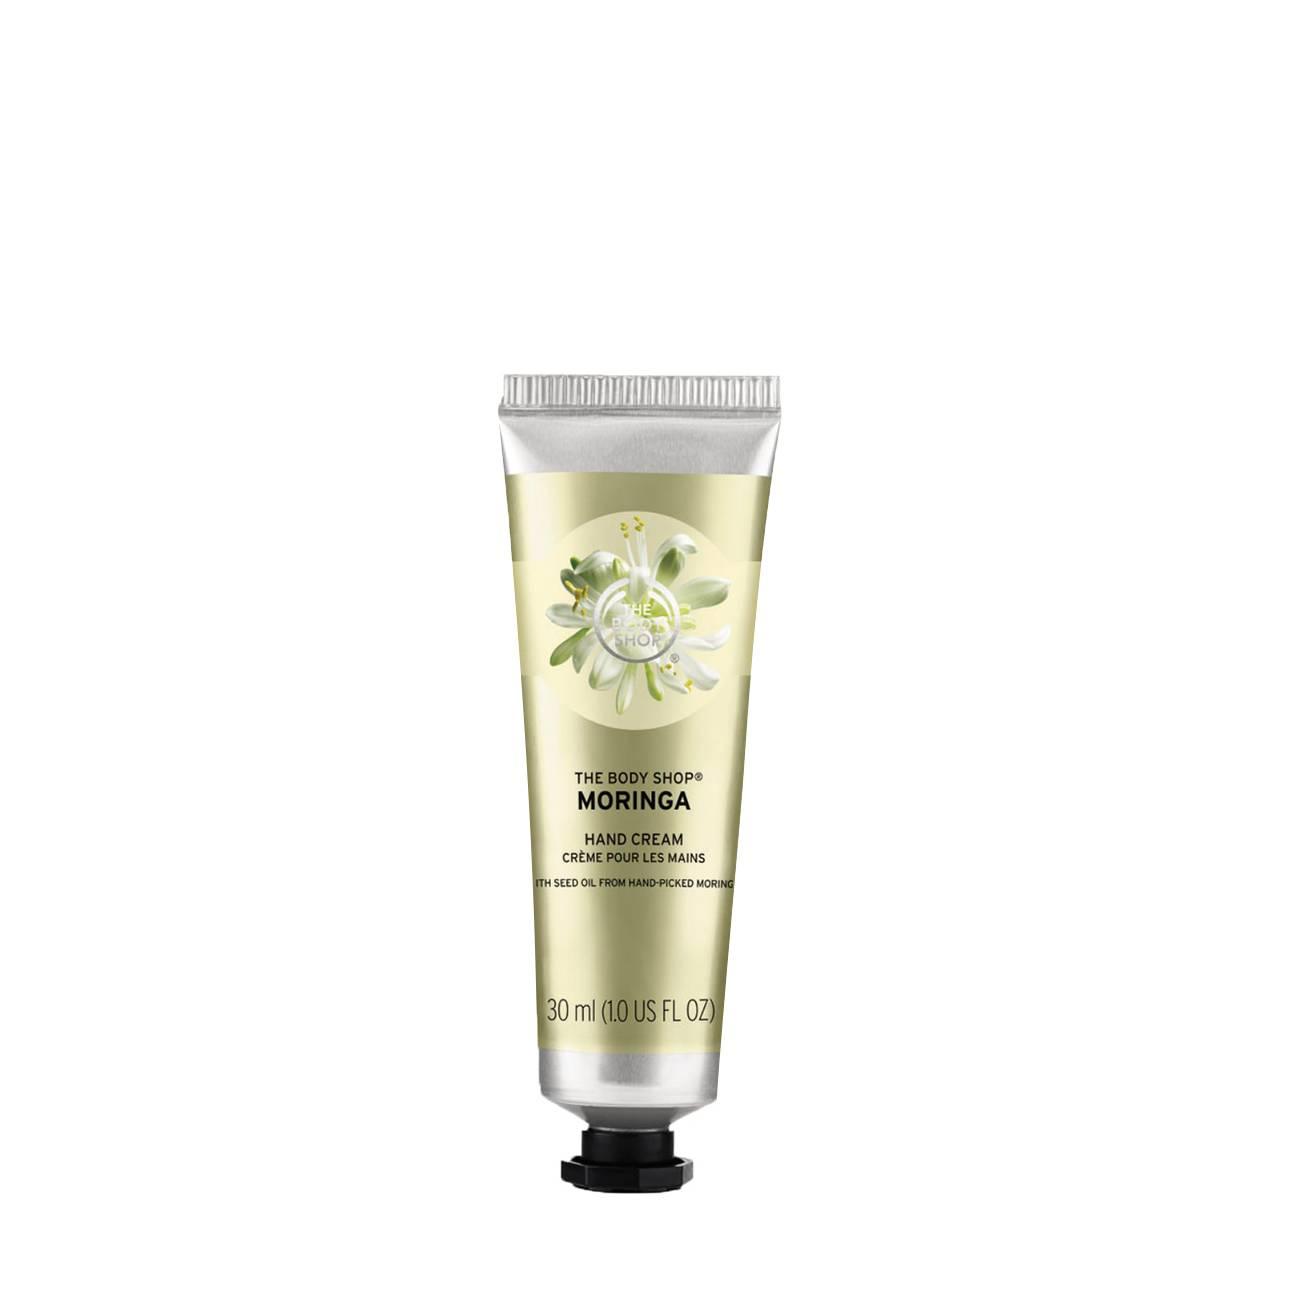 Moringa Hand Cream 30ml The Body Shop imagine 2021 bestvalue.eu